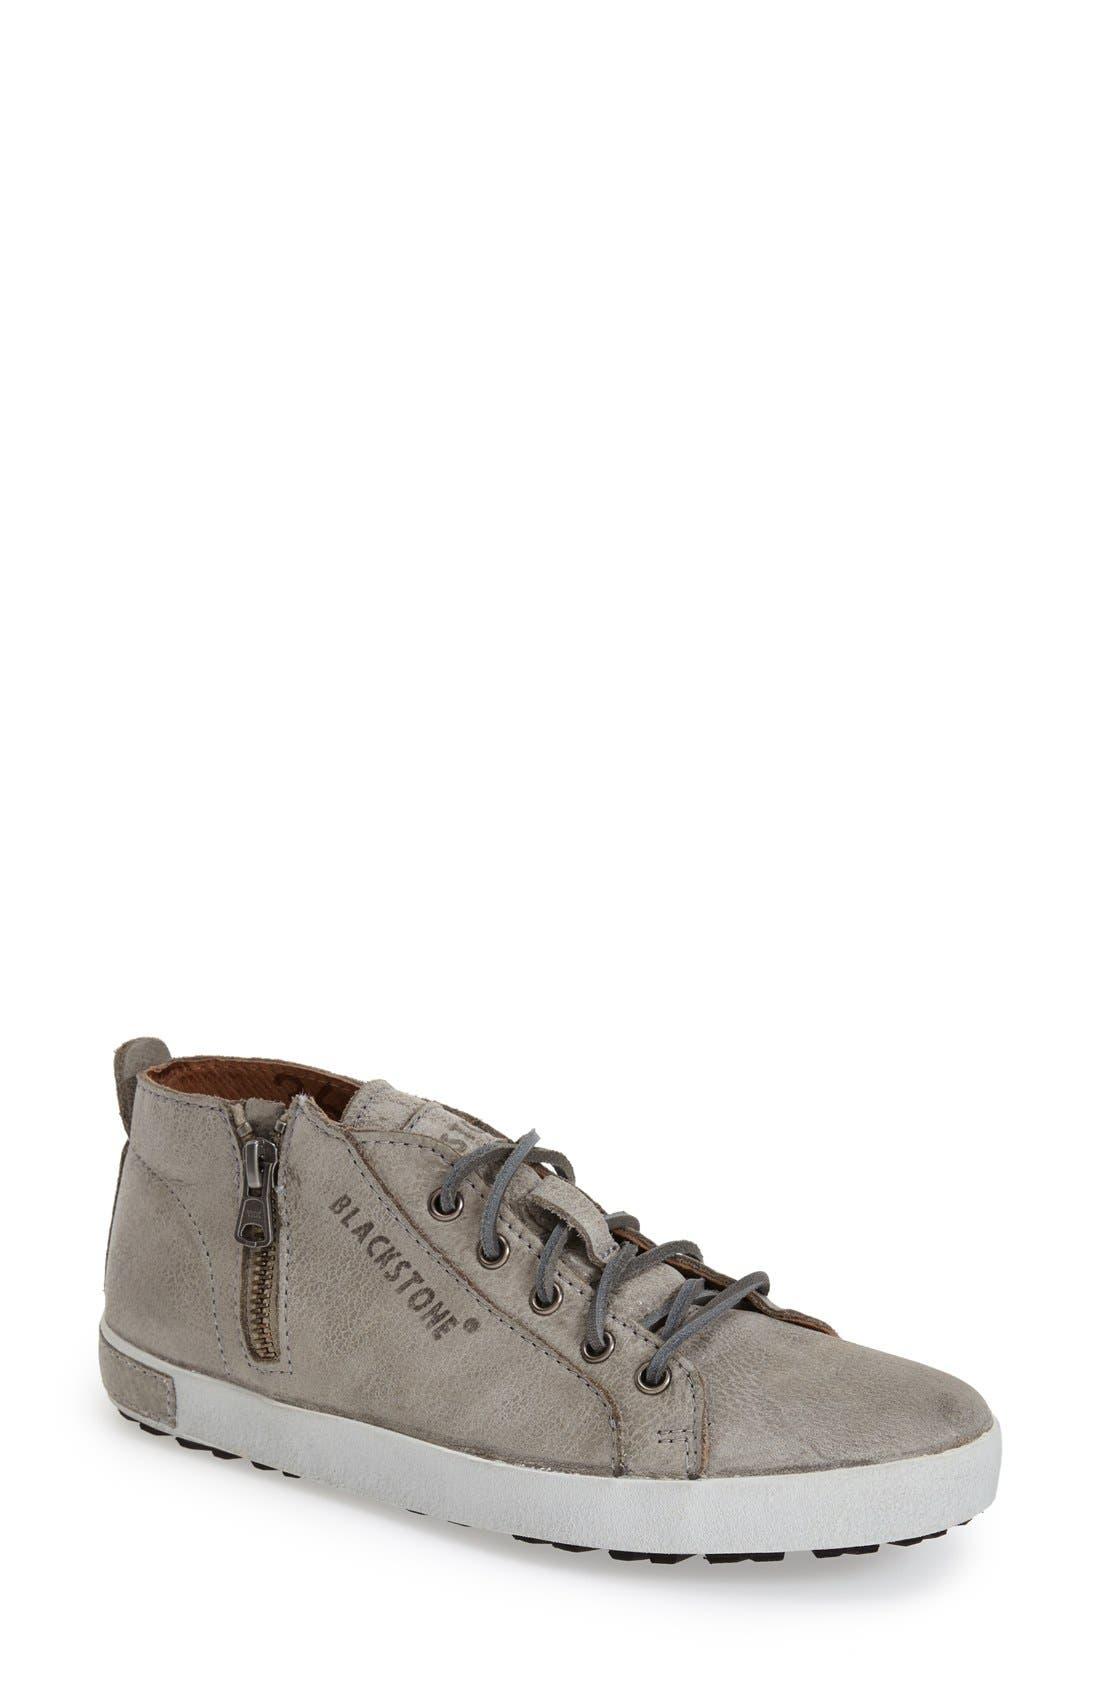 Main Image - Blackstone 'JL17' Sneaker (Women)